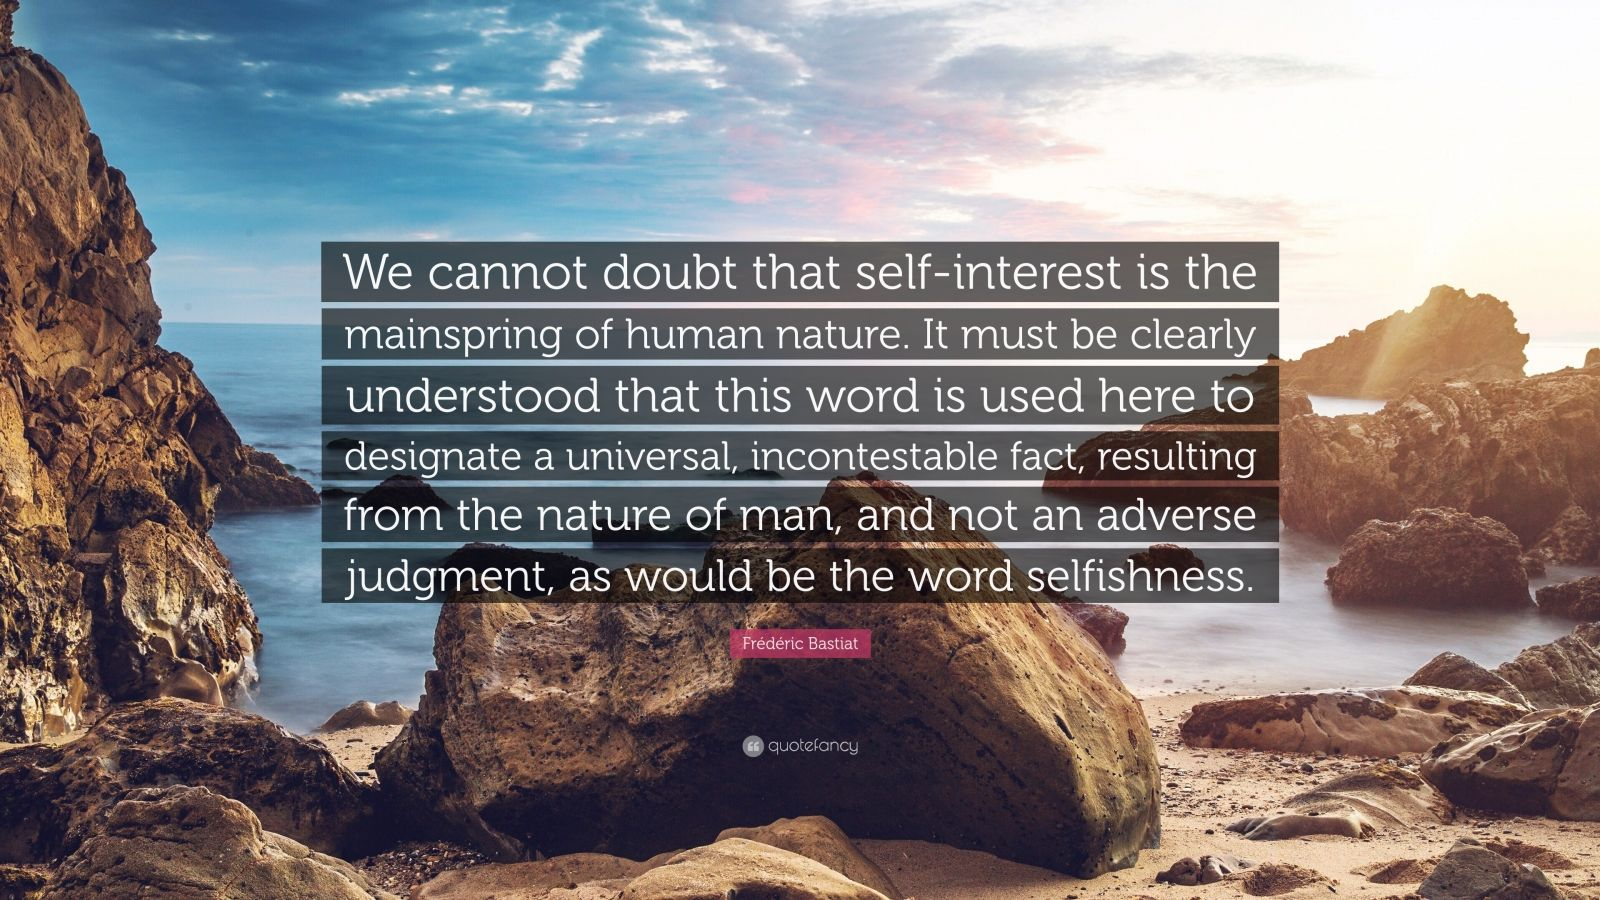 human nature self interest altruism Śāntideva on self-interest and altruism on august 16, 2017 august 16, 2017 by global philosophy in buddhist , ethics , india , metaphysics , tibet authors: amod lele (boston university), and anna lännström (stonehill college.